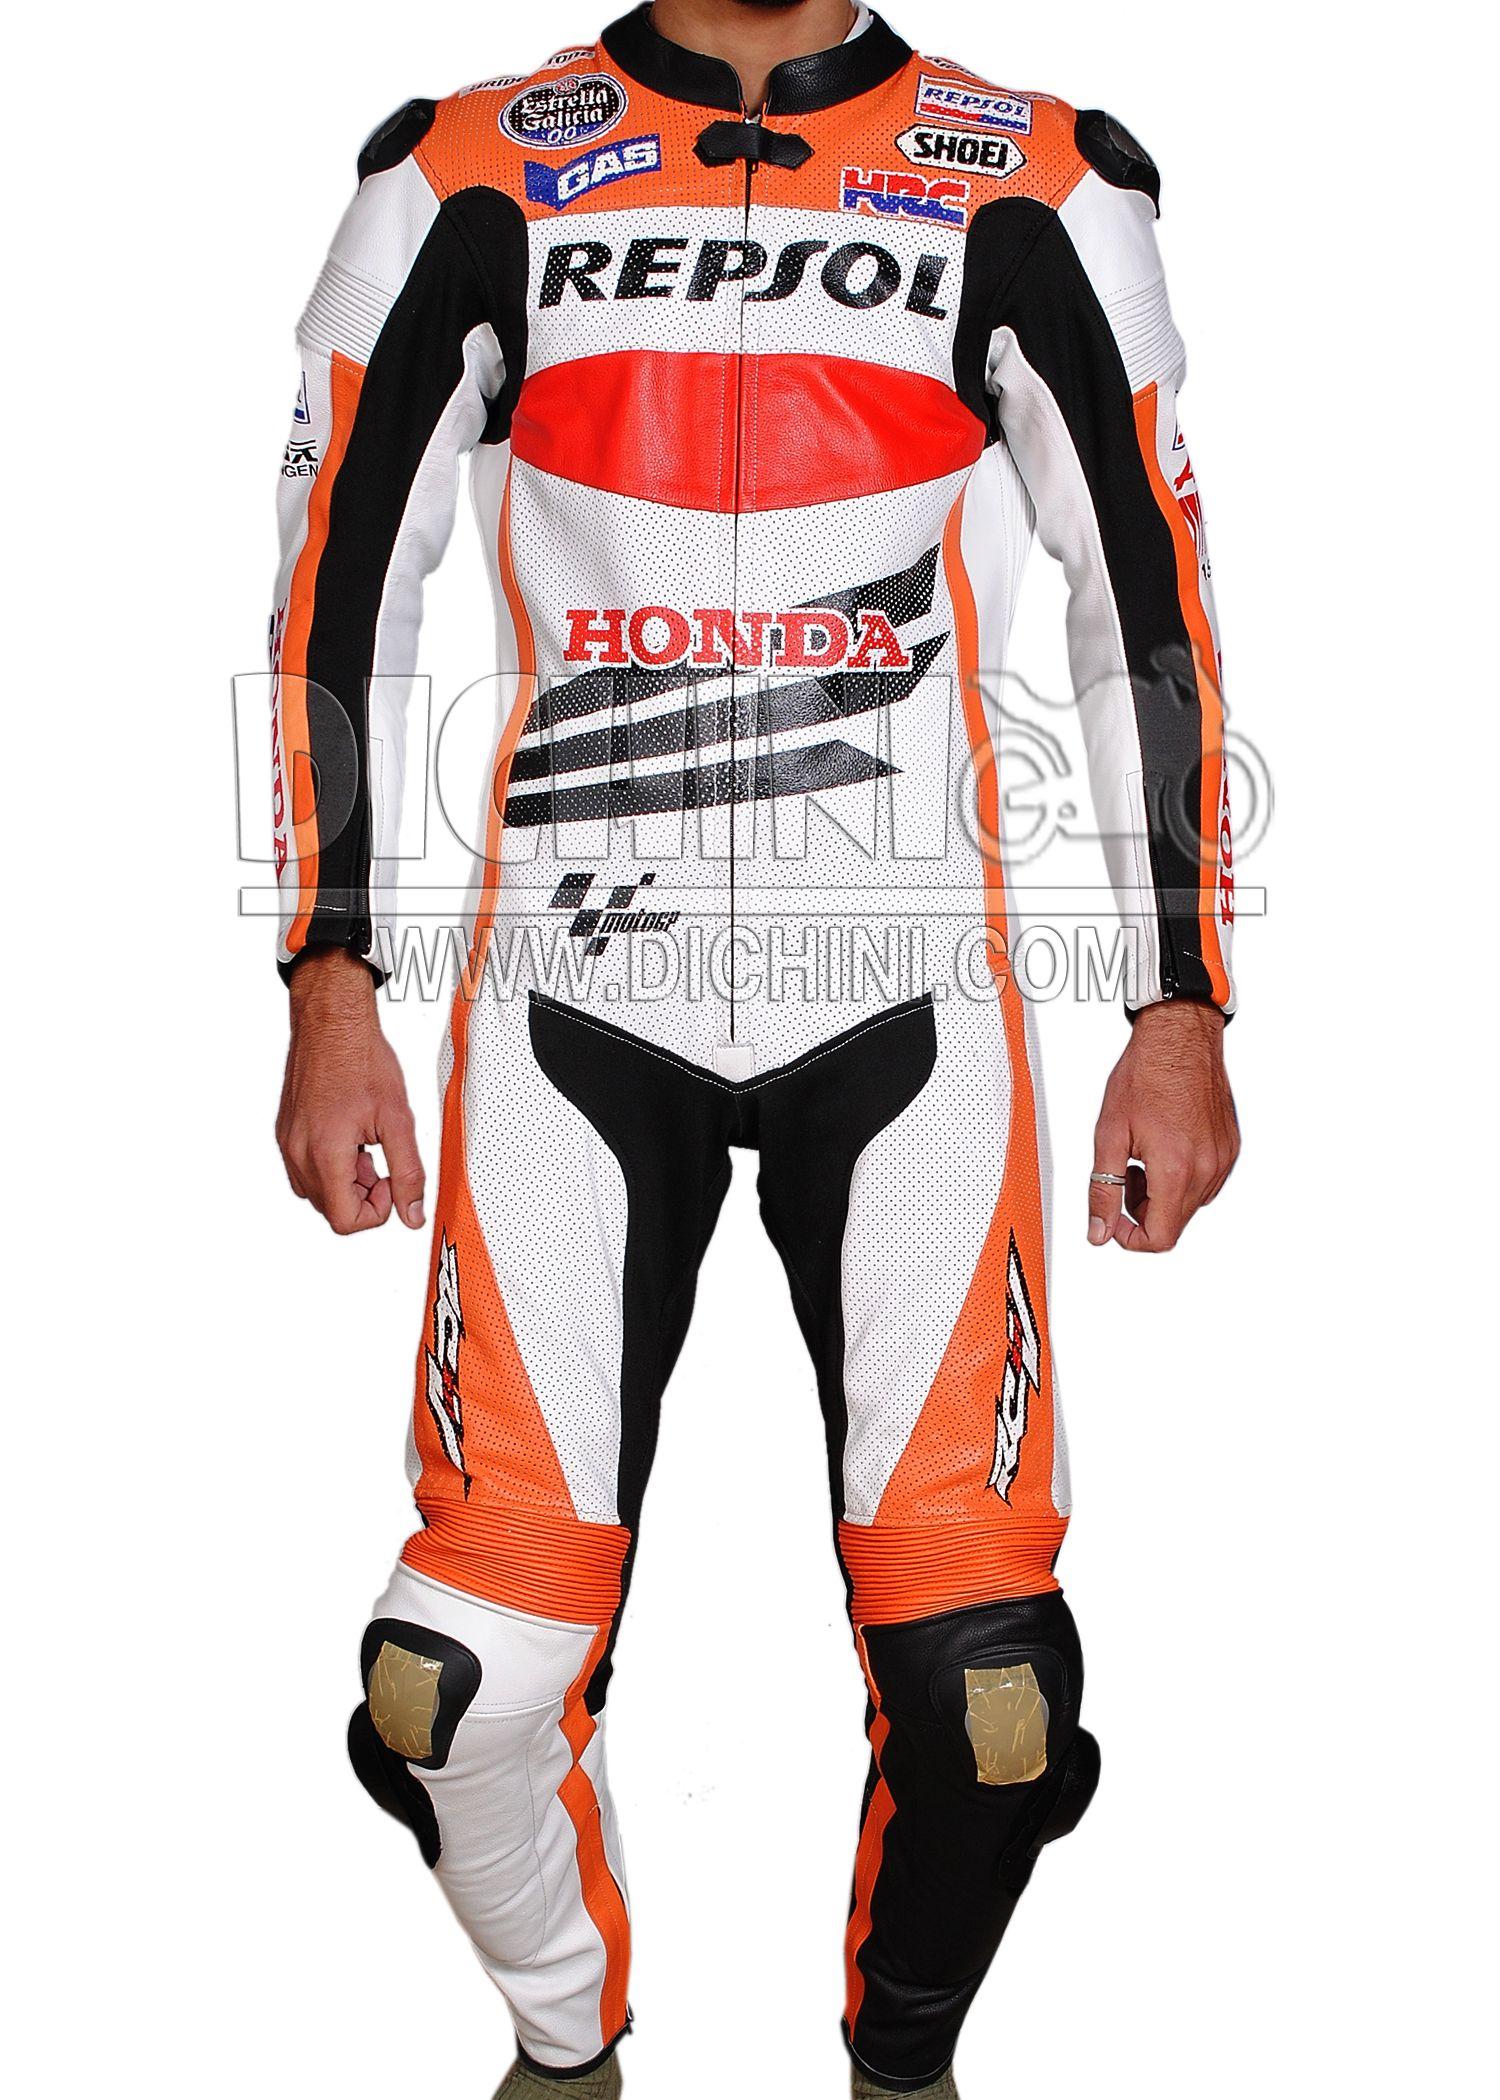 Motogp Leather Marques Marc Repsol Honda Motocycle 2013 Suit 2014 6wZgqtxTgO